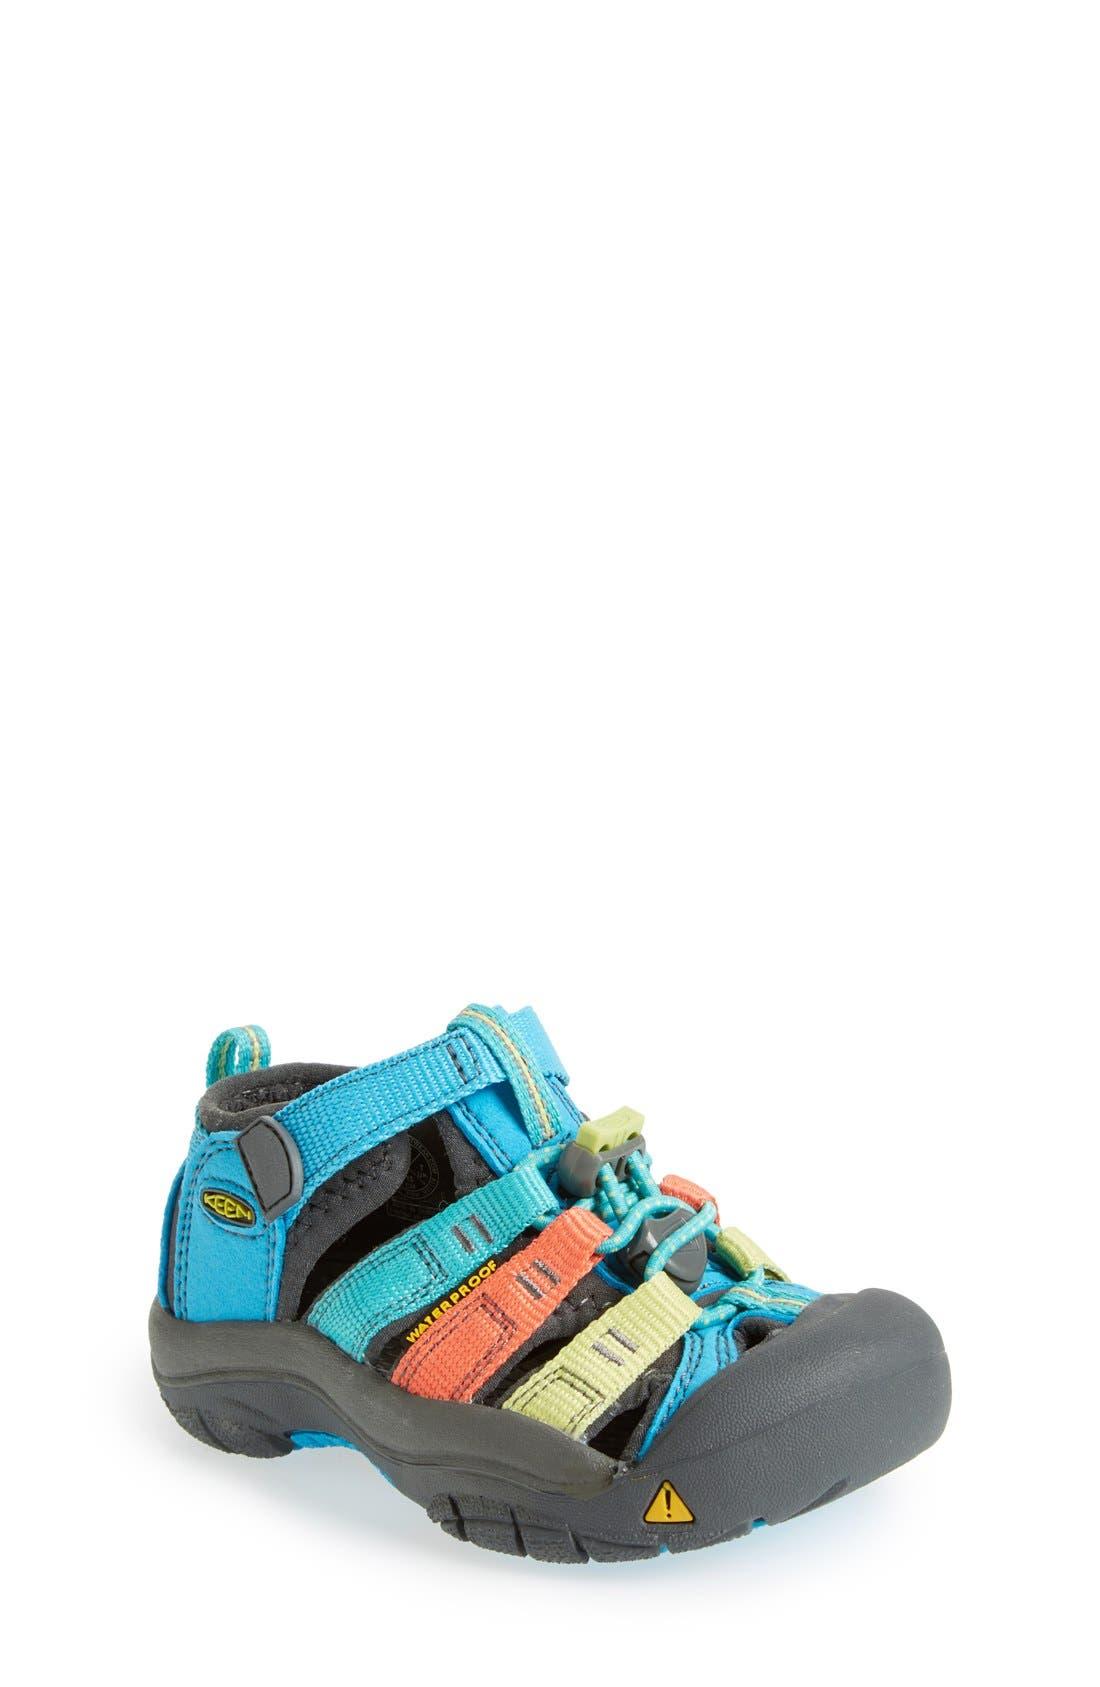 Main Image - Keen 'Newport H2' Waterproof Sandal (Baby, Walker, Toddler, Little Kid & Big Kid)